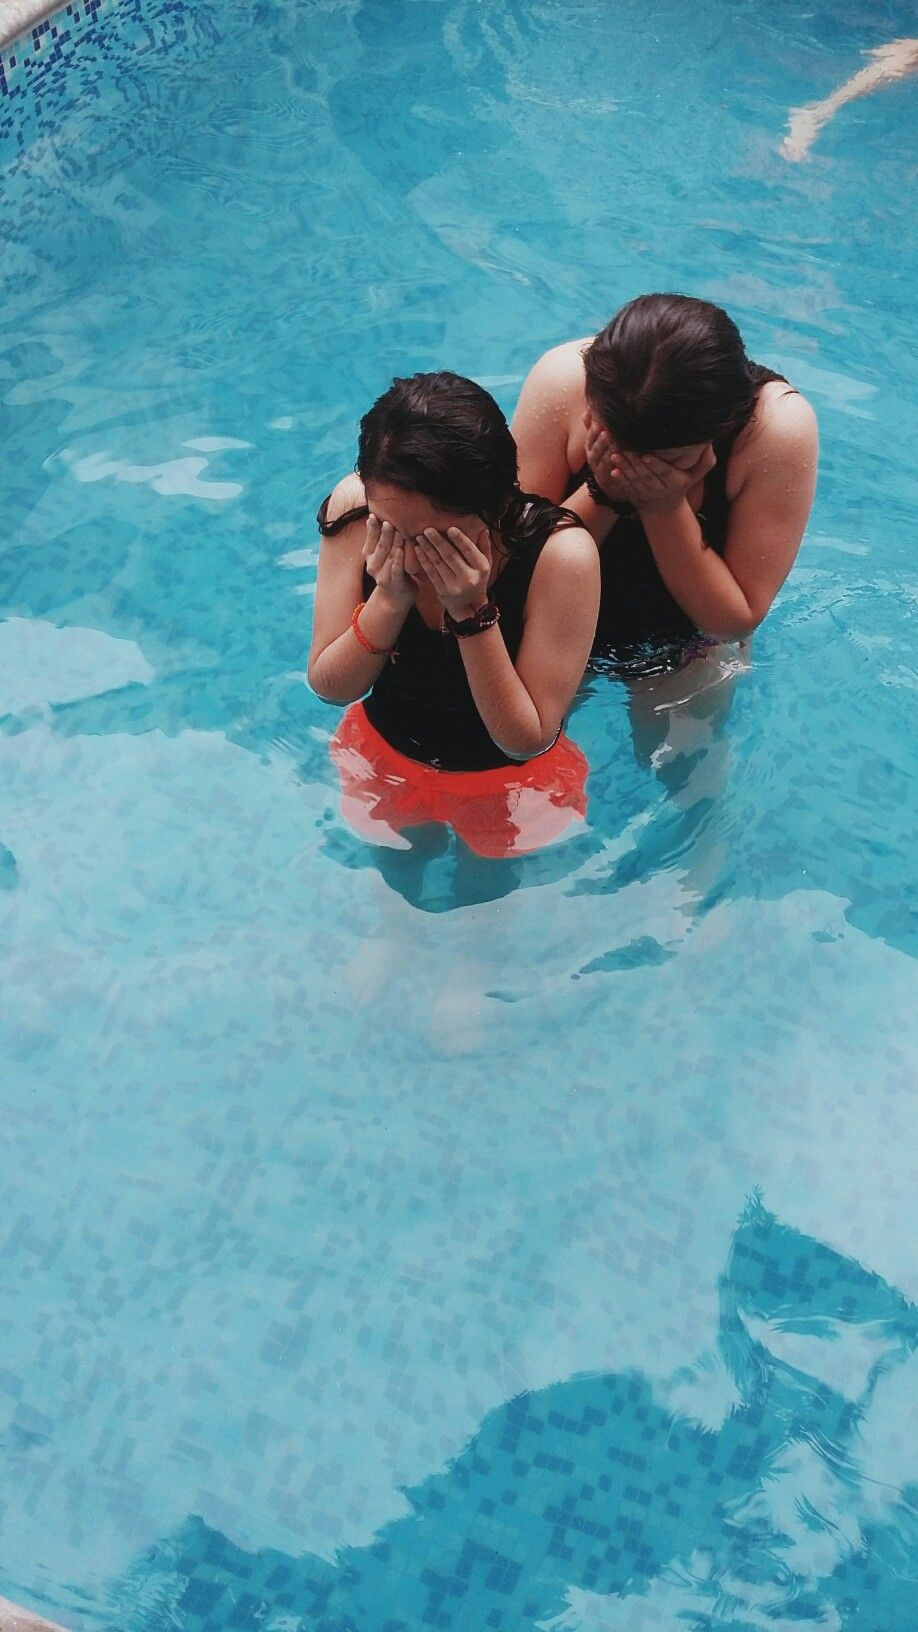 summer pool tumblr. #Tumblr #Fondo De Pantalla #Wallpaper #Alberca #Pool #Girls #Friendship Summer Pool Tumblr